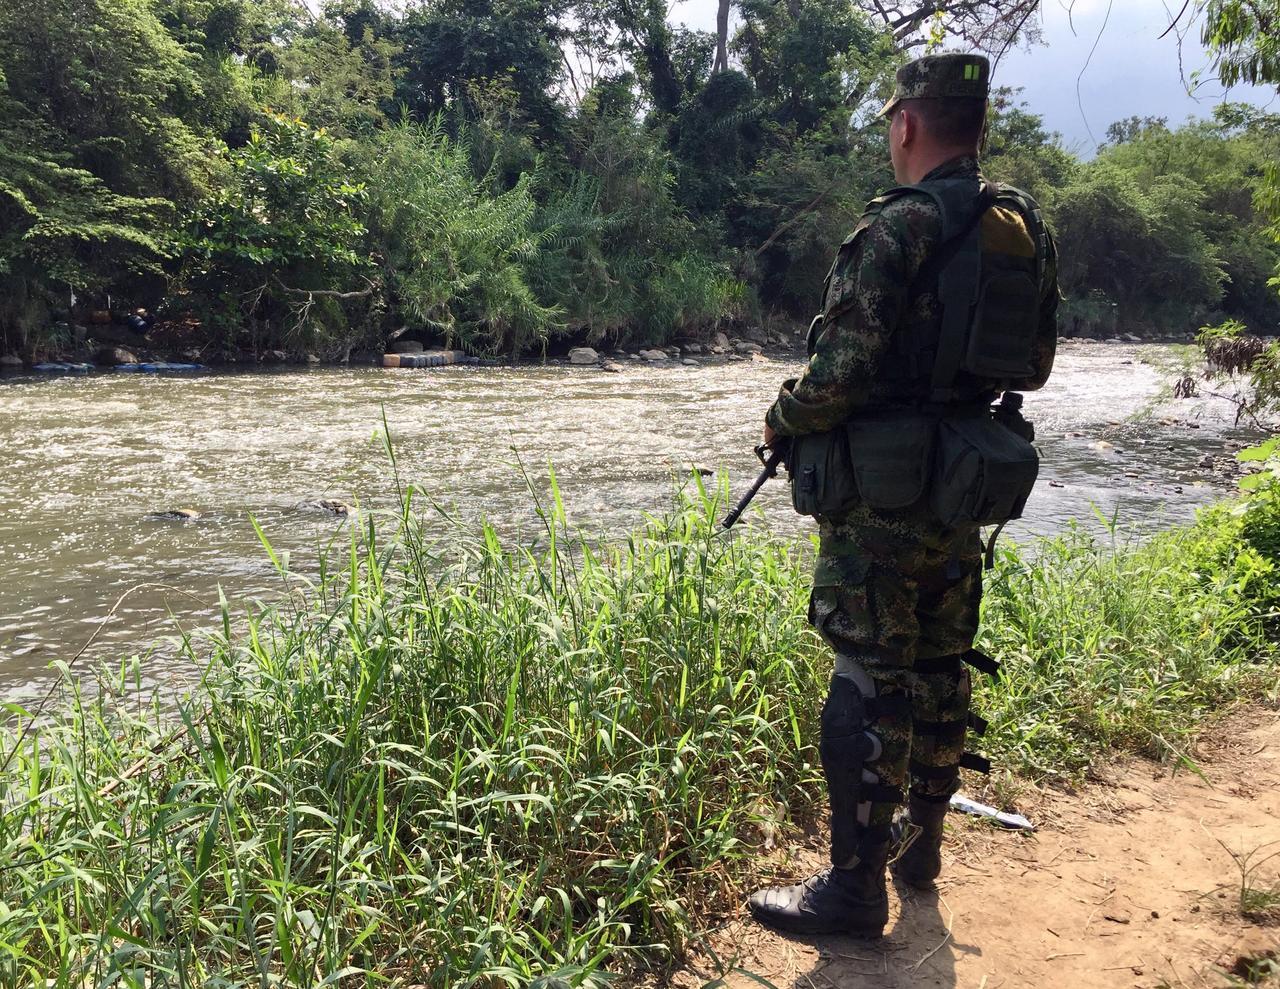 Colombia, Brazil tighten borders as Venezuelan crisis